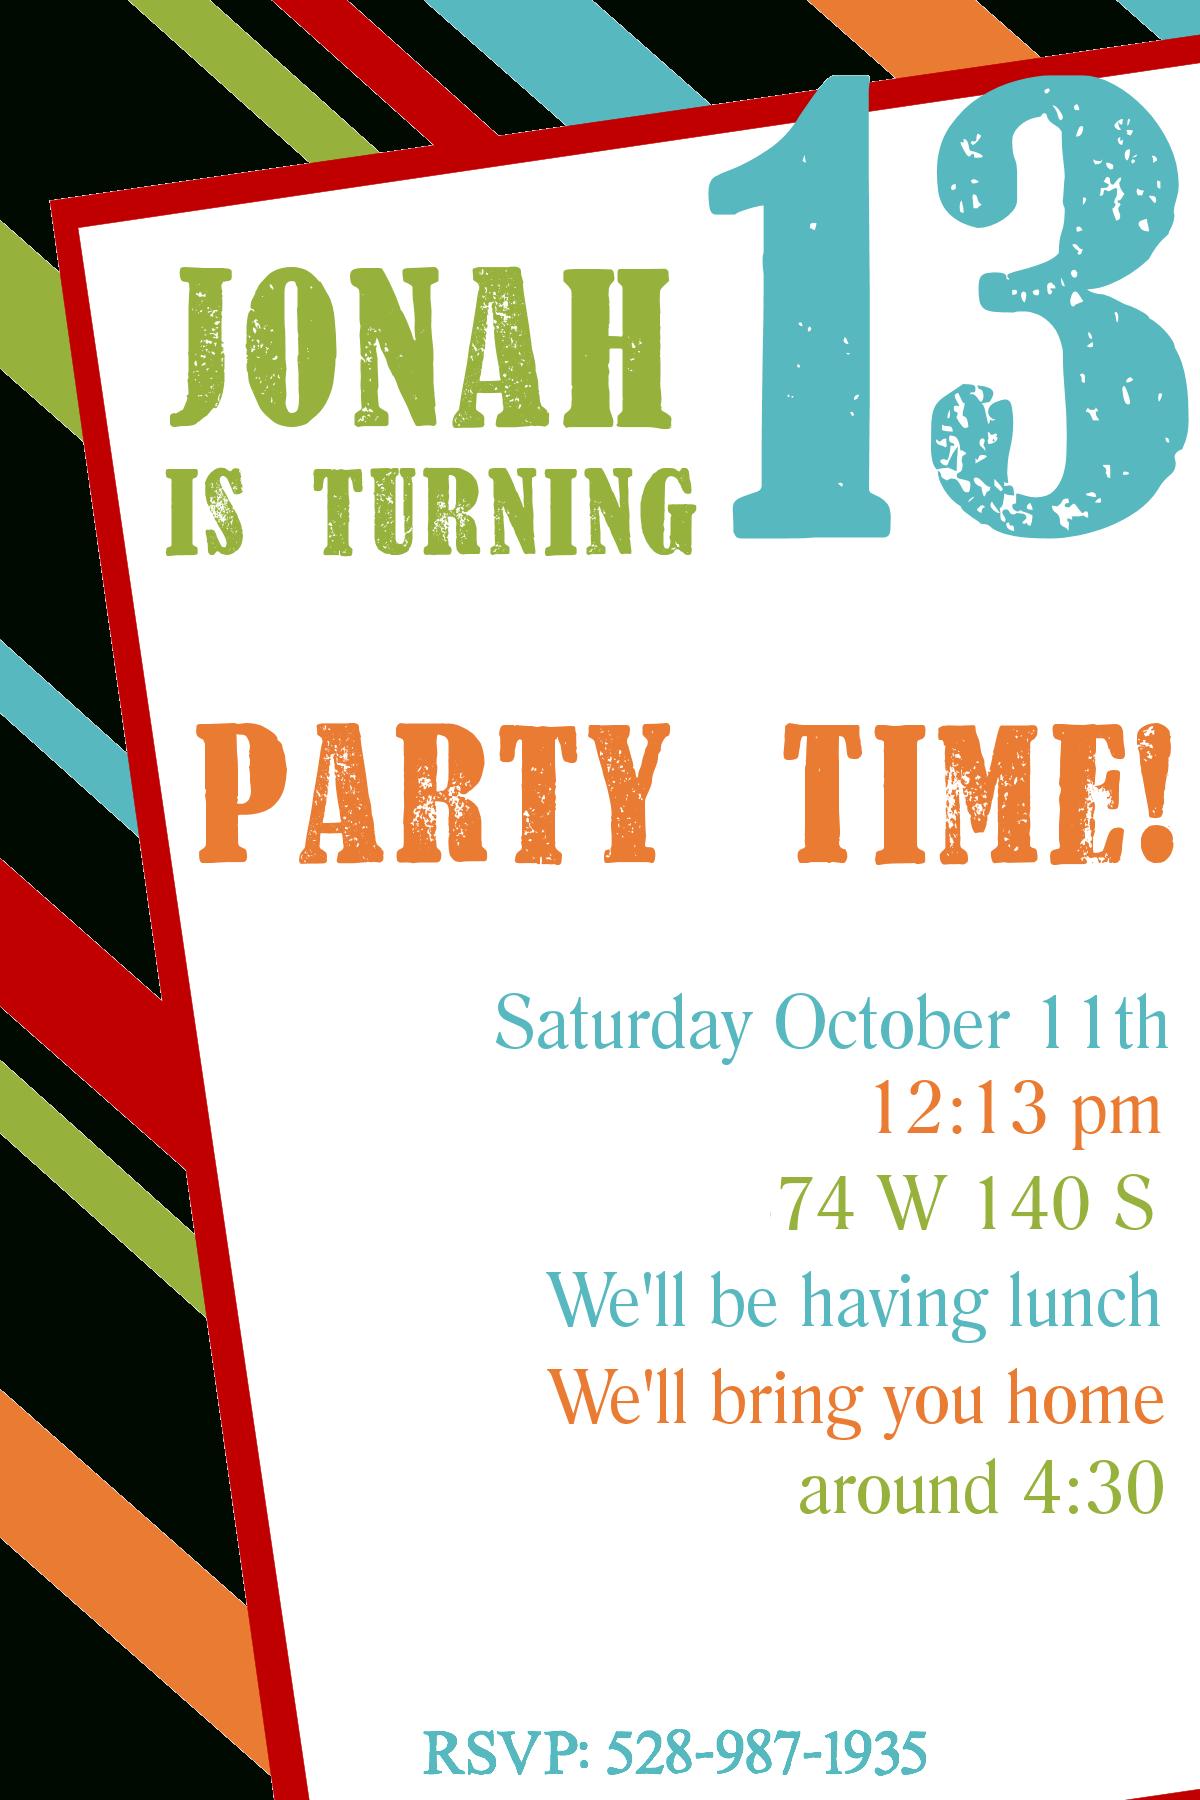 Free Printable Birthday Invitation Templates - Make A Birthday Invitation Online Free Printable